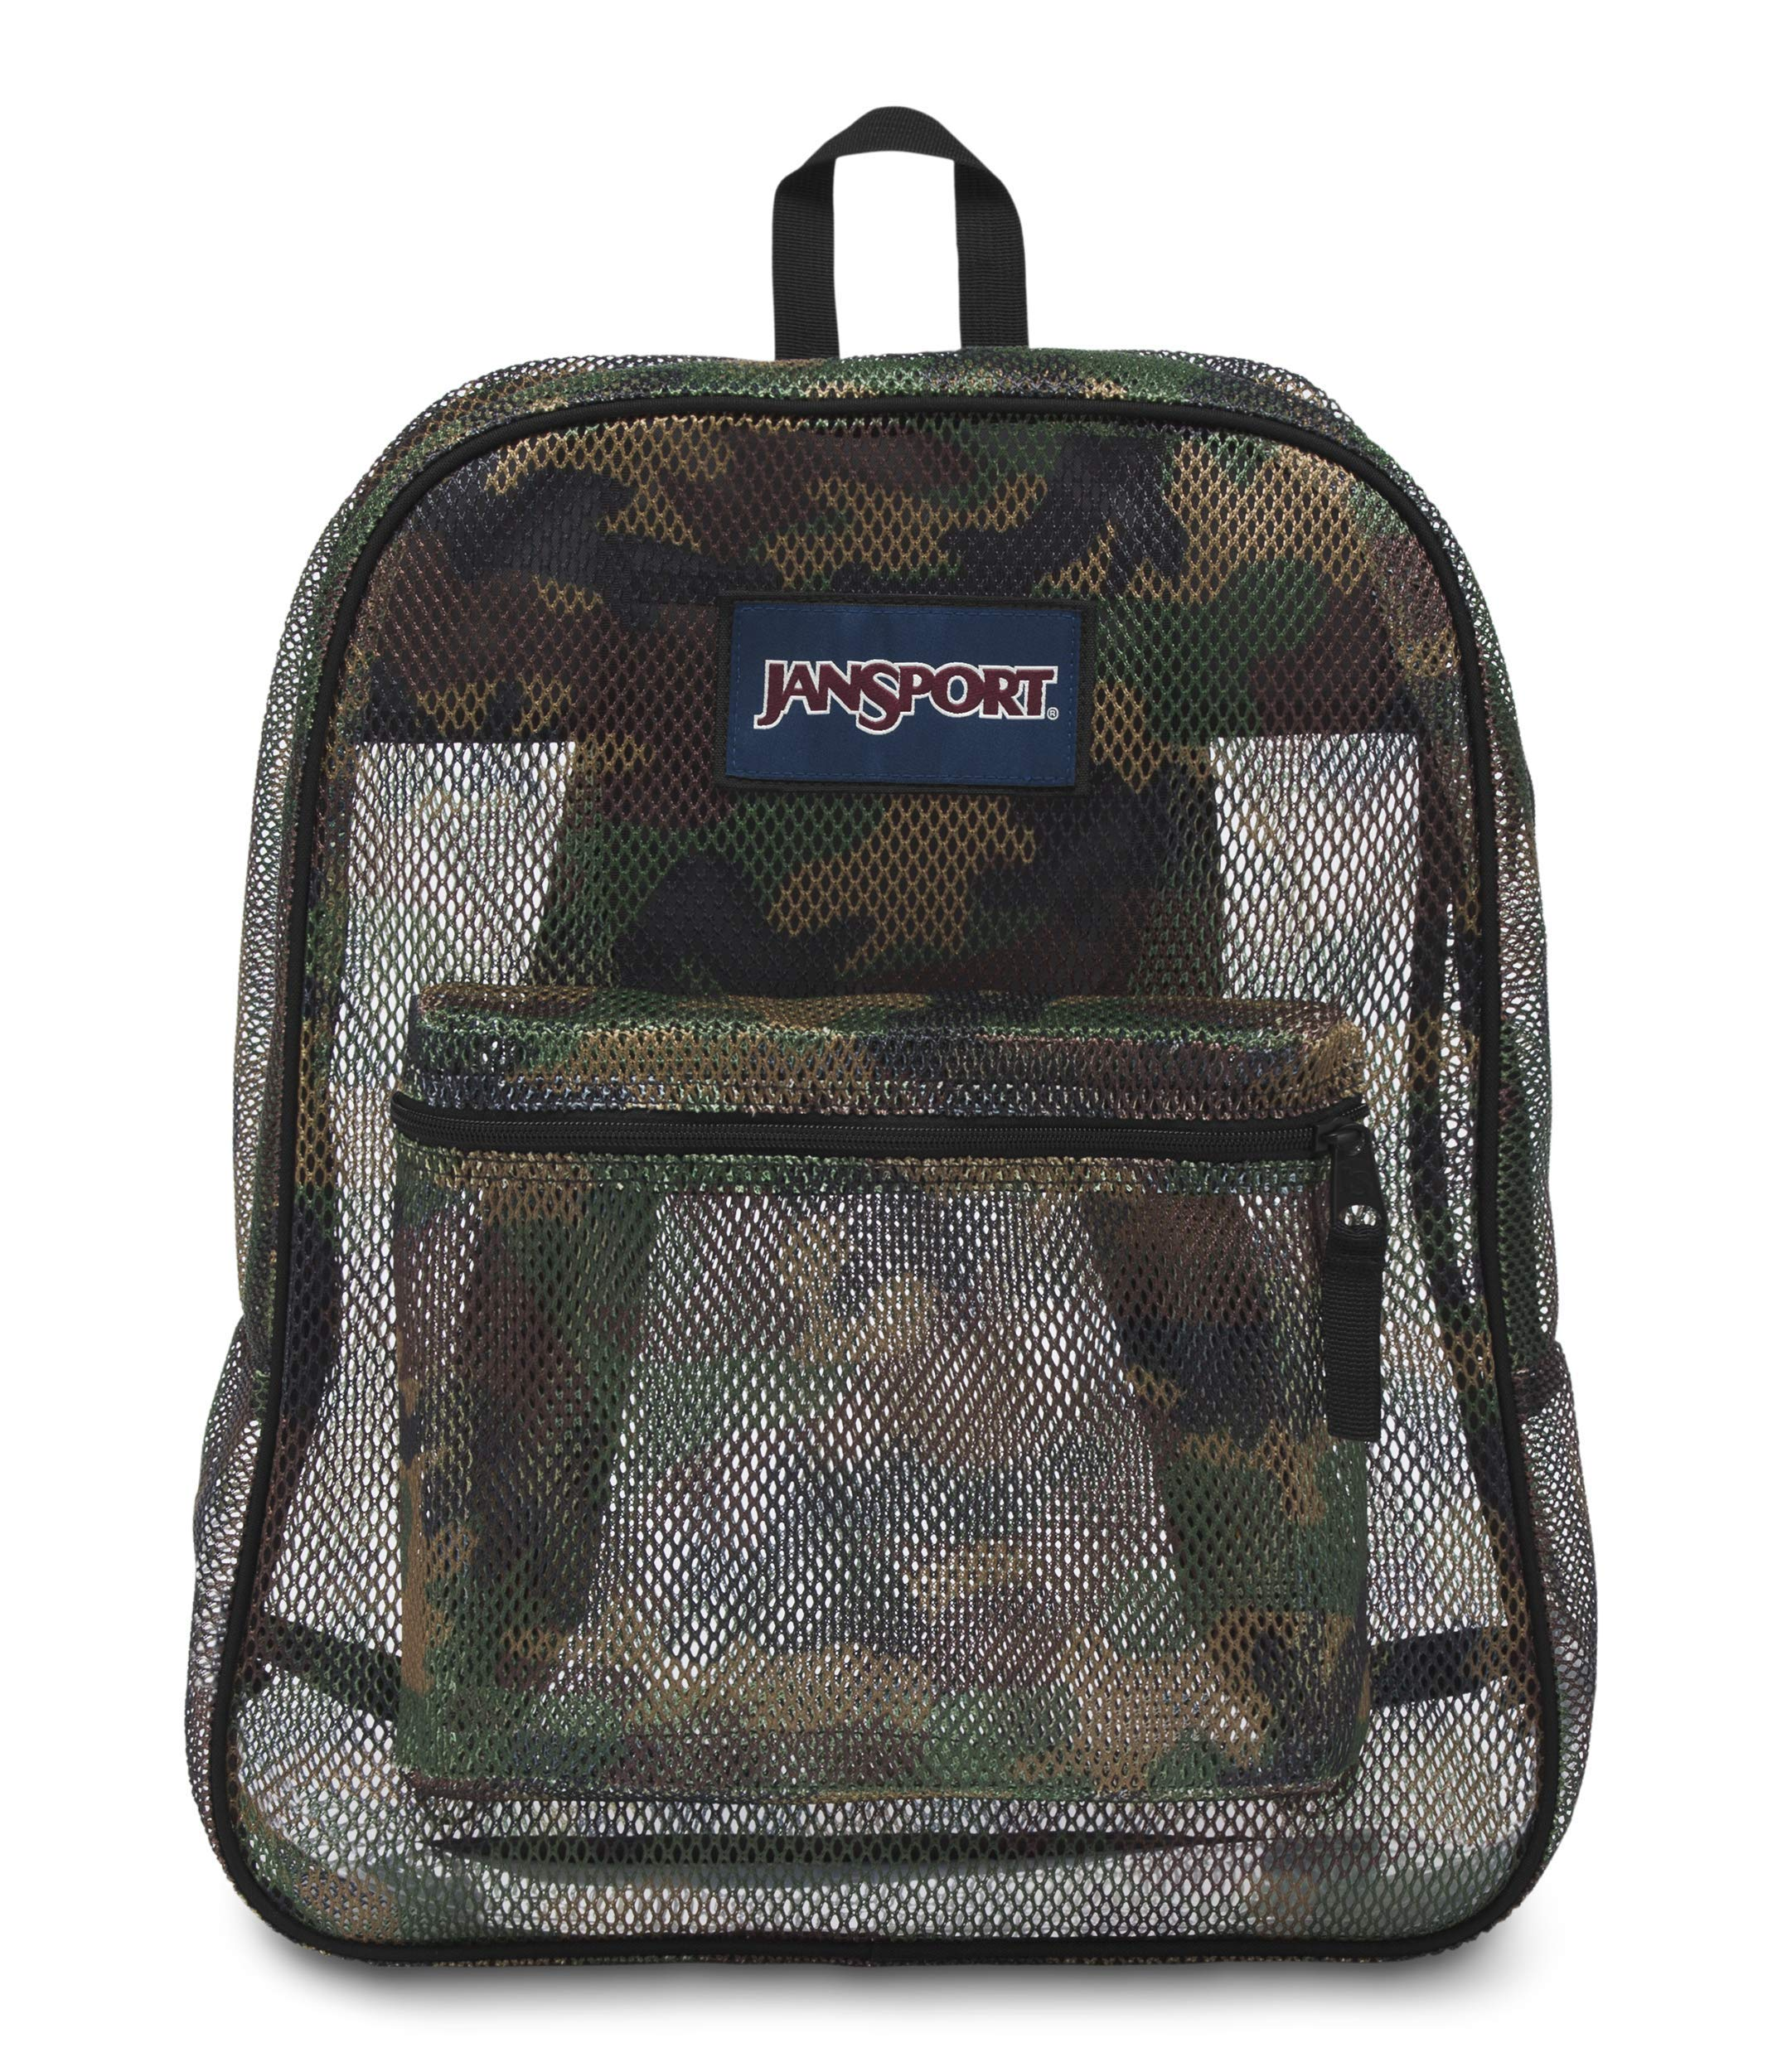 JanSport Mesh Pack Backpack Surplus Camo